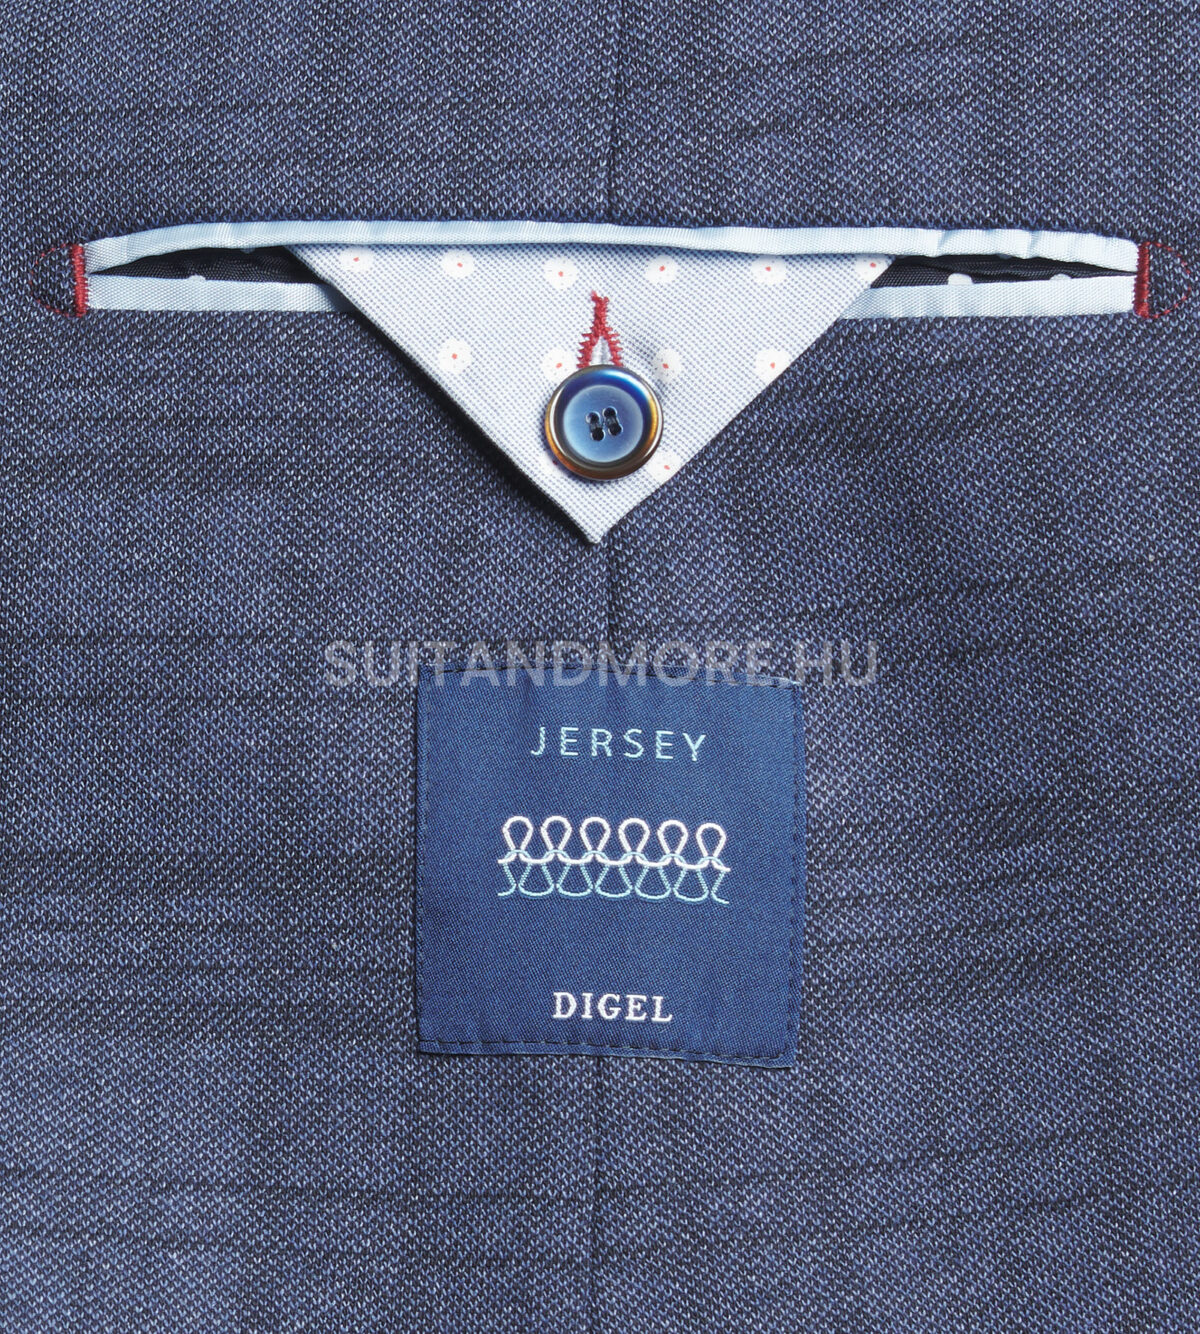 digel-kozepkek-modern-fit-kockas-jersey-zako-edward-f-st-1172398-25